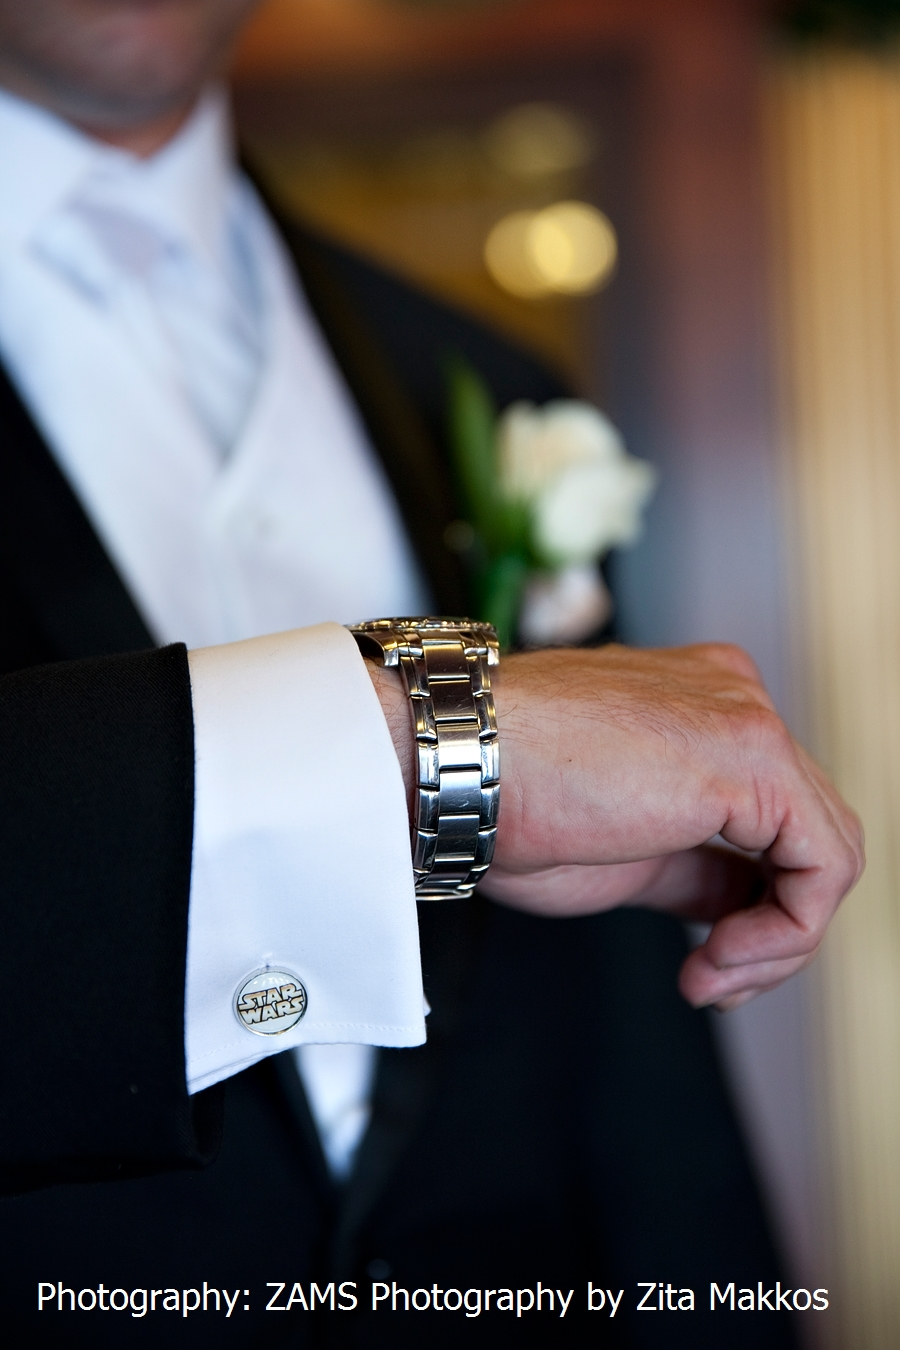 star_wars_stormtrooper_2_cuff_links_men_wedding_groom_cufflinks_2.jpg